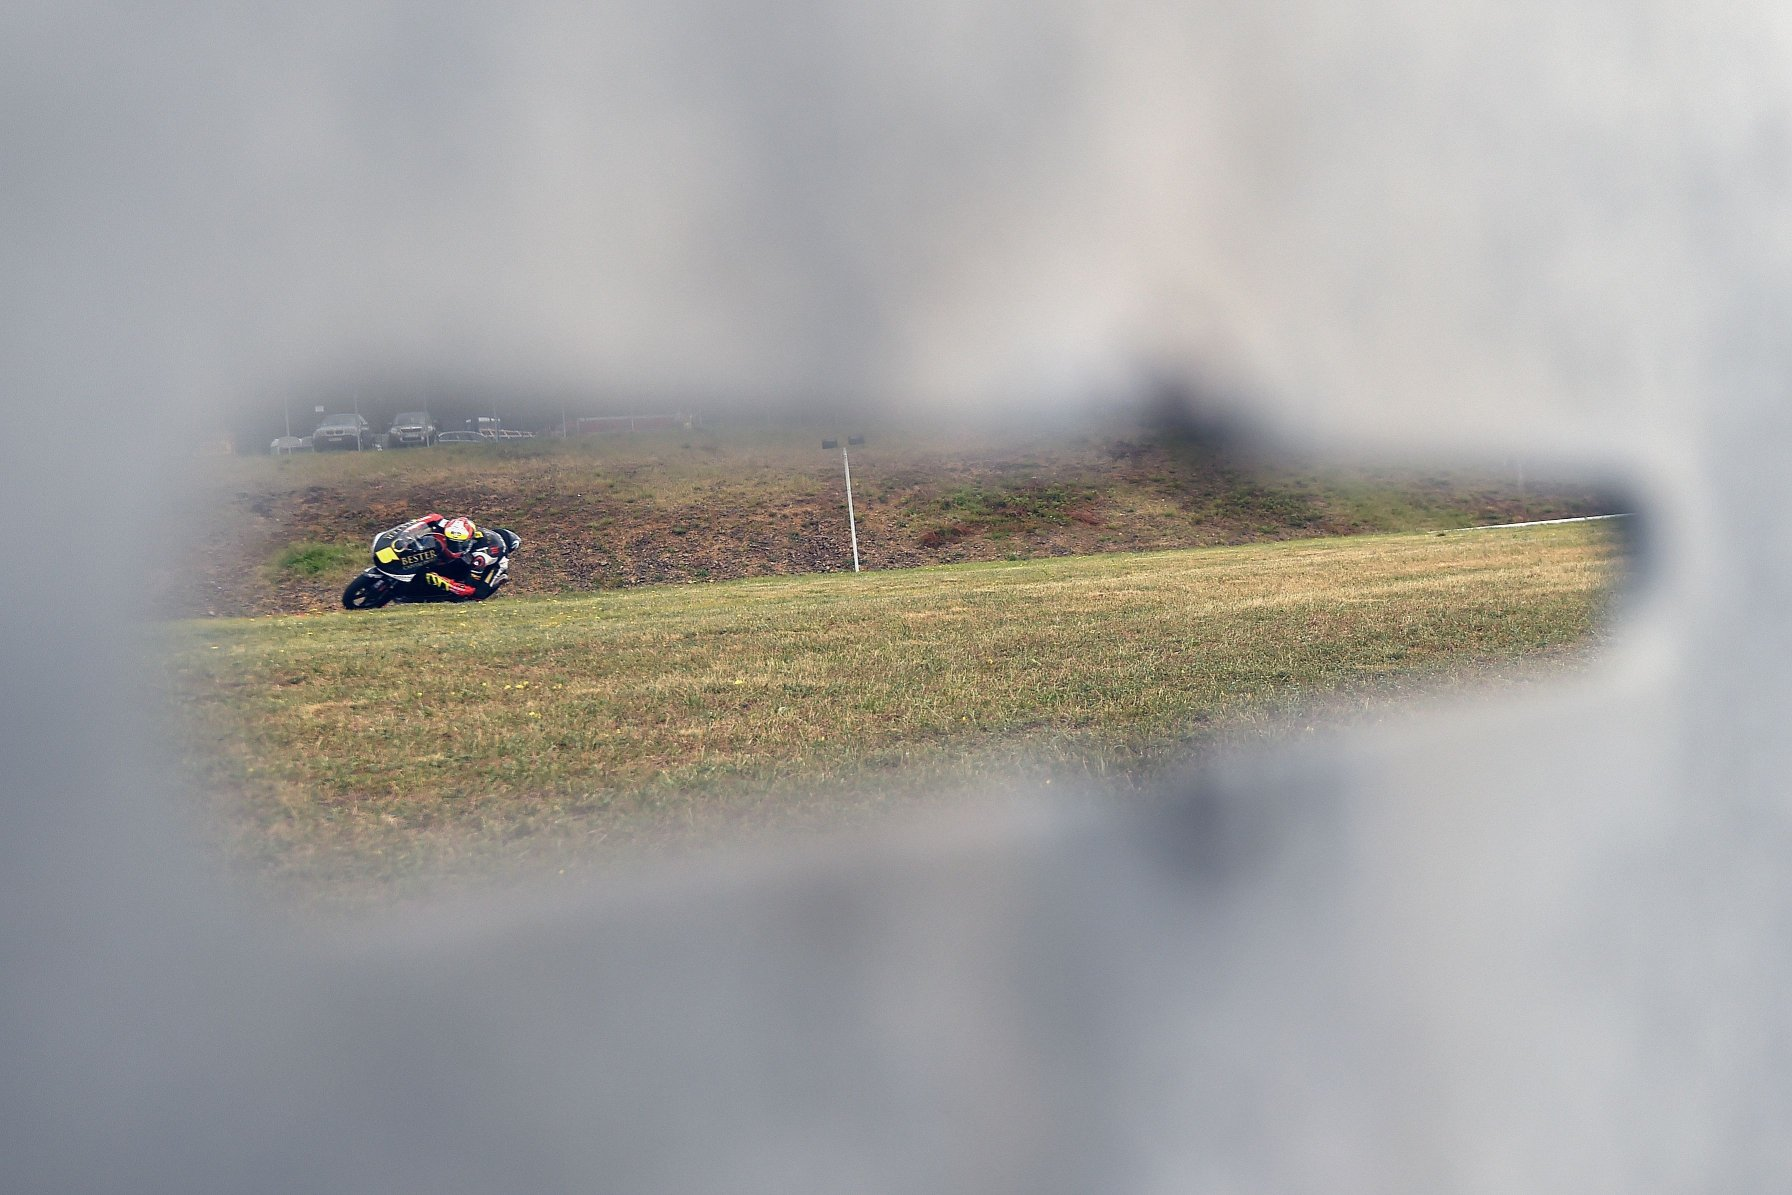 MotoGP Repubblica Ceca 2019, Qualifiche - Diretta Esclusiva Sky Sport, differita Tv8